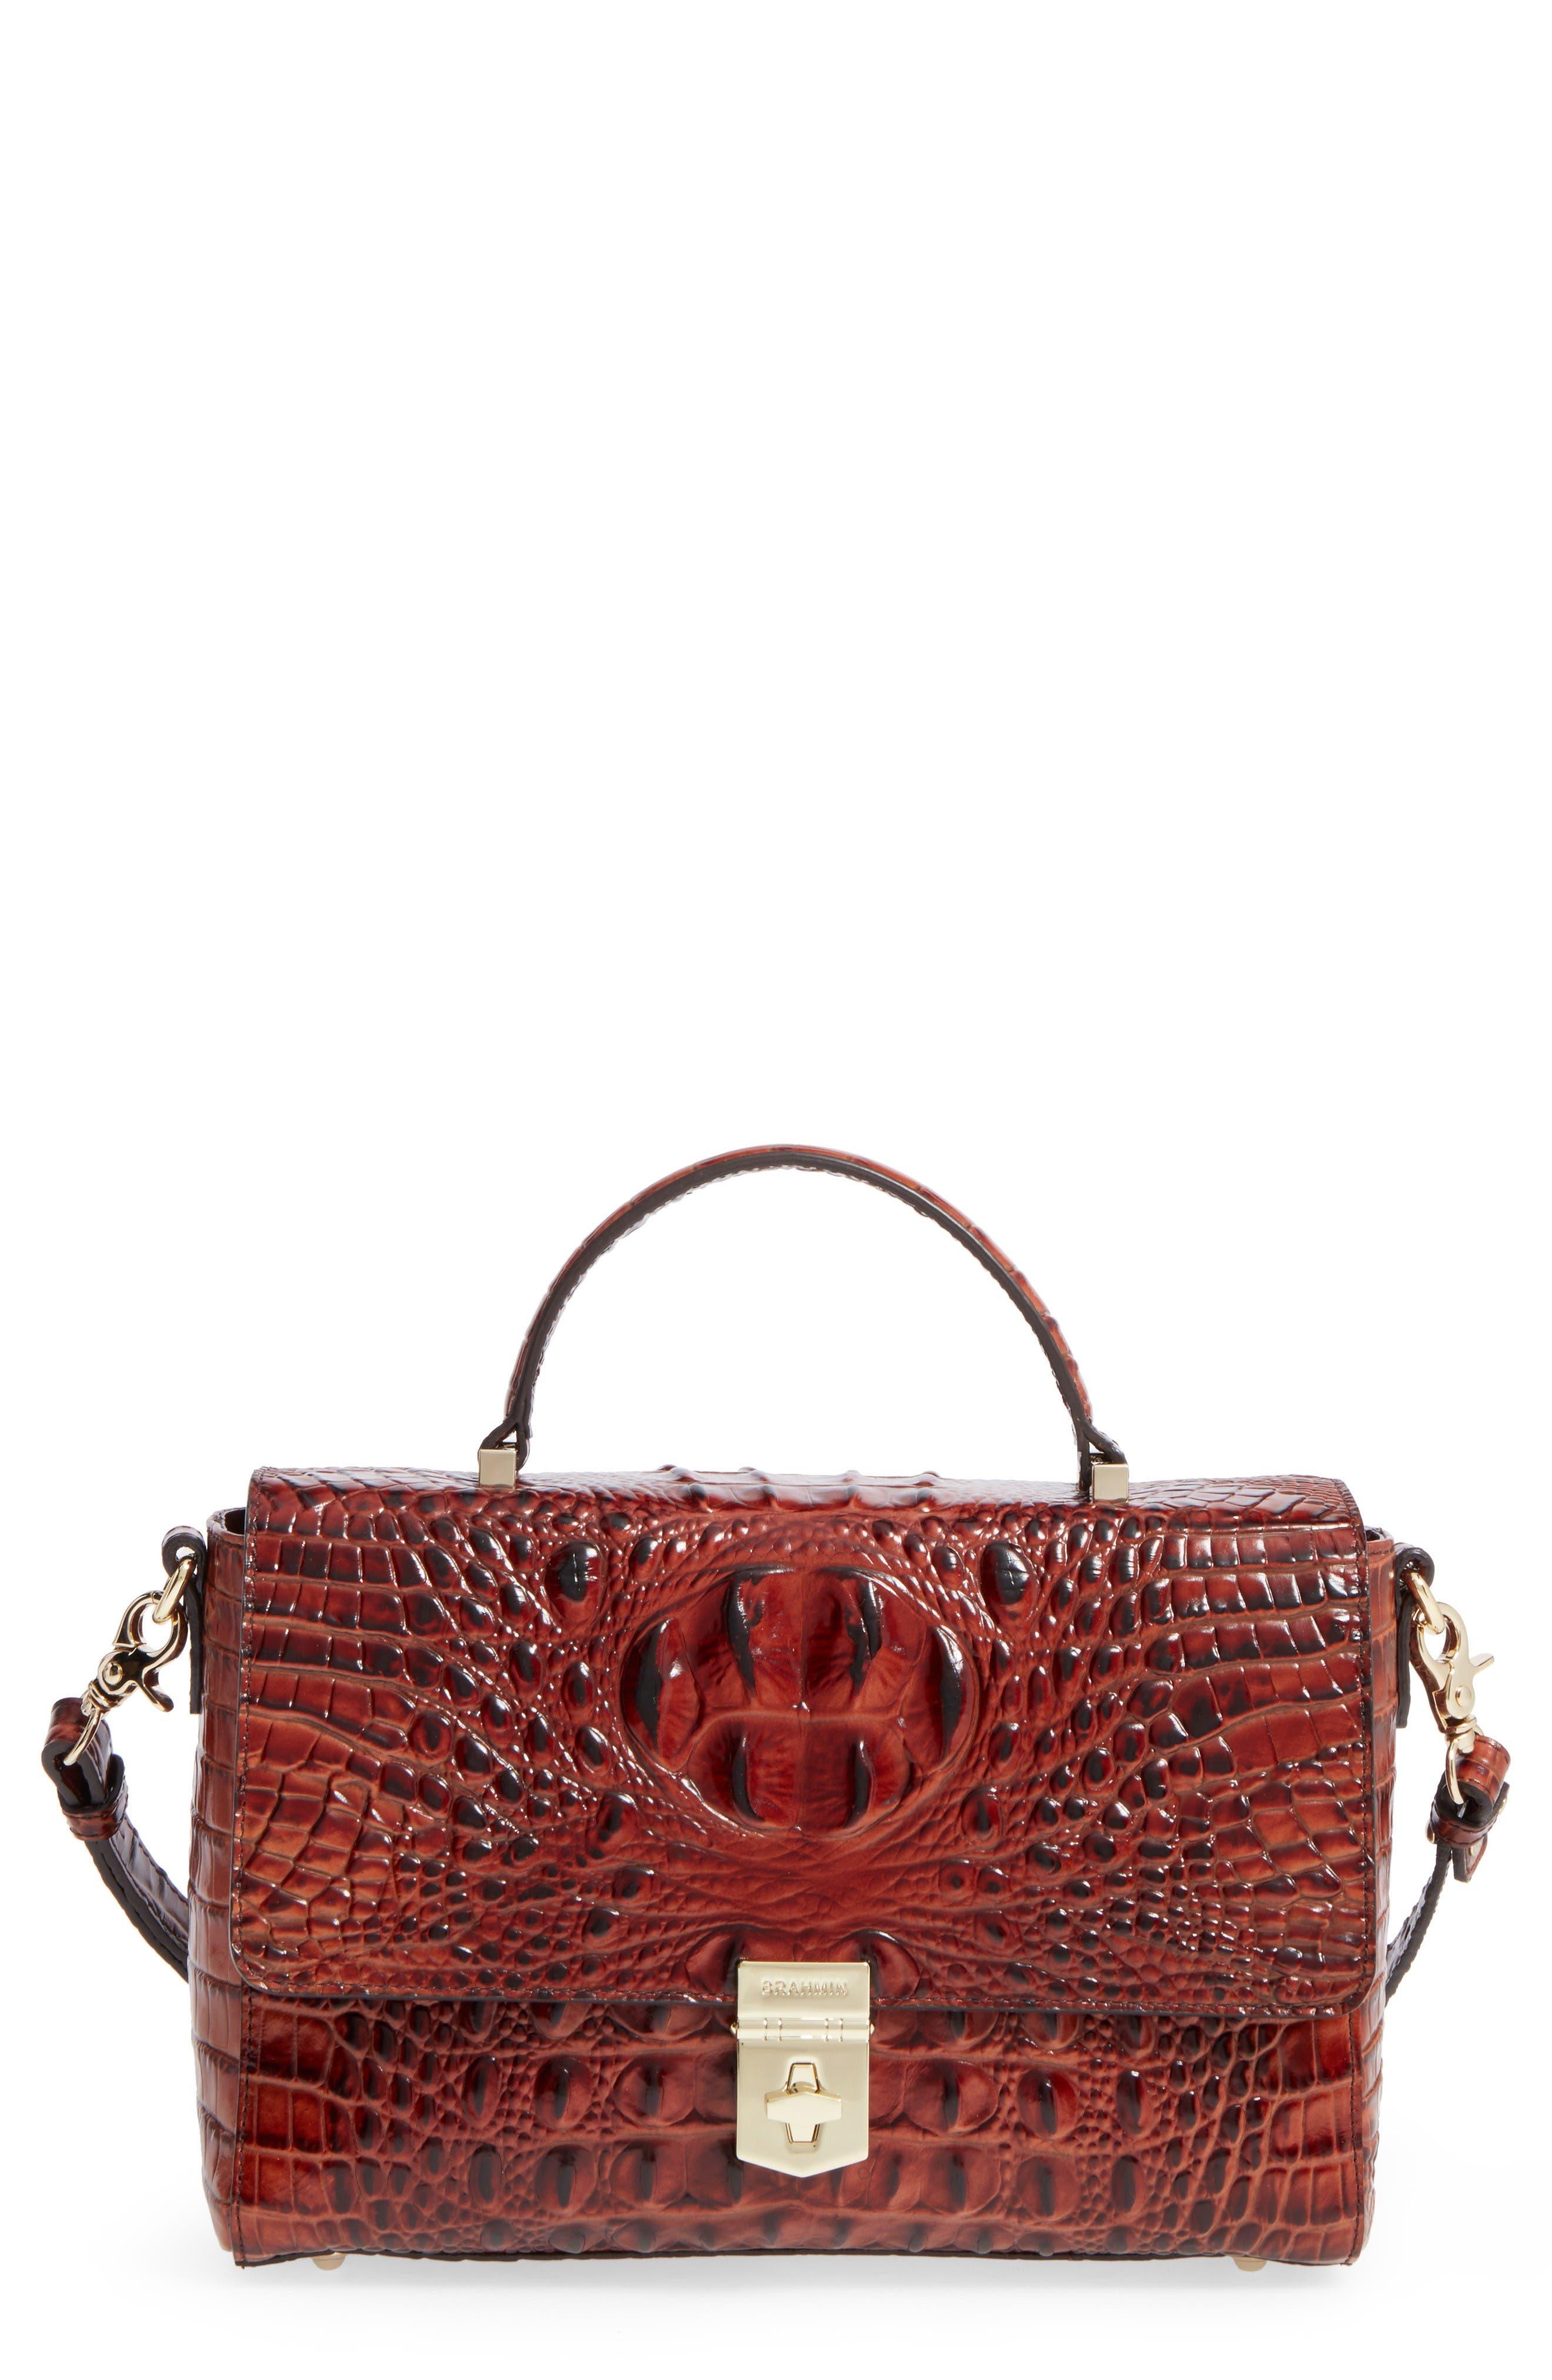 Brahmin Danielle Leather Top Handle Satchel